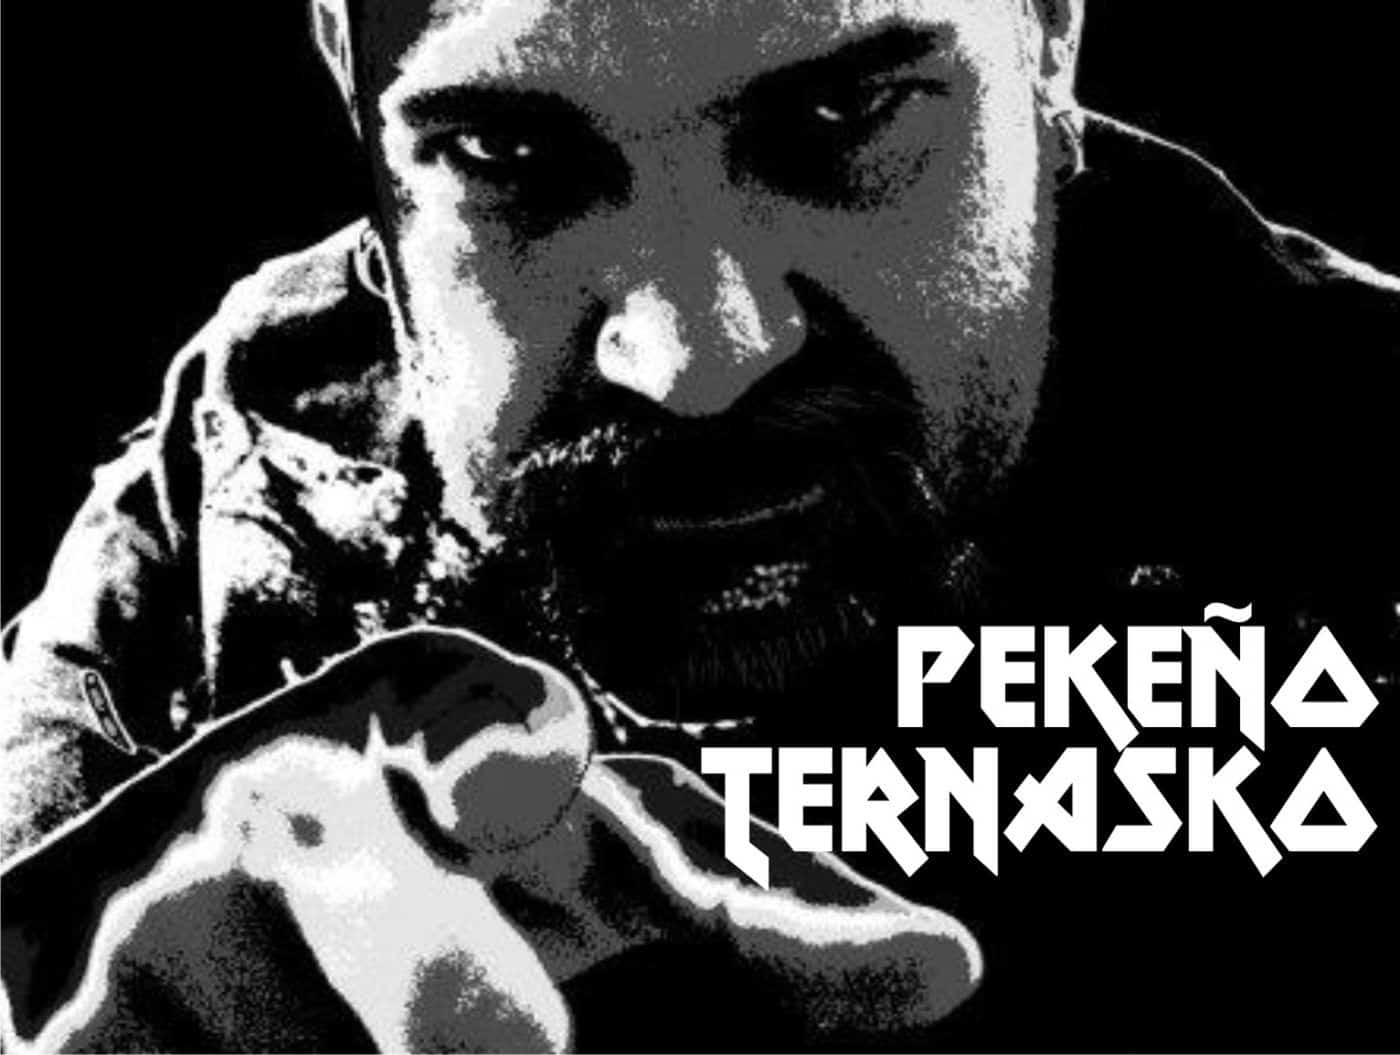 Podcast Radio online A la carta Rock Pekeño Ternasko